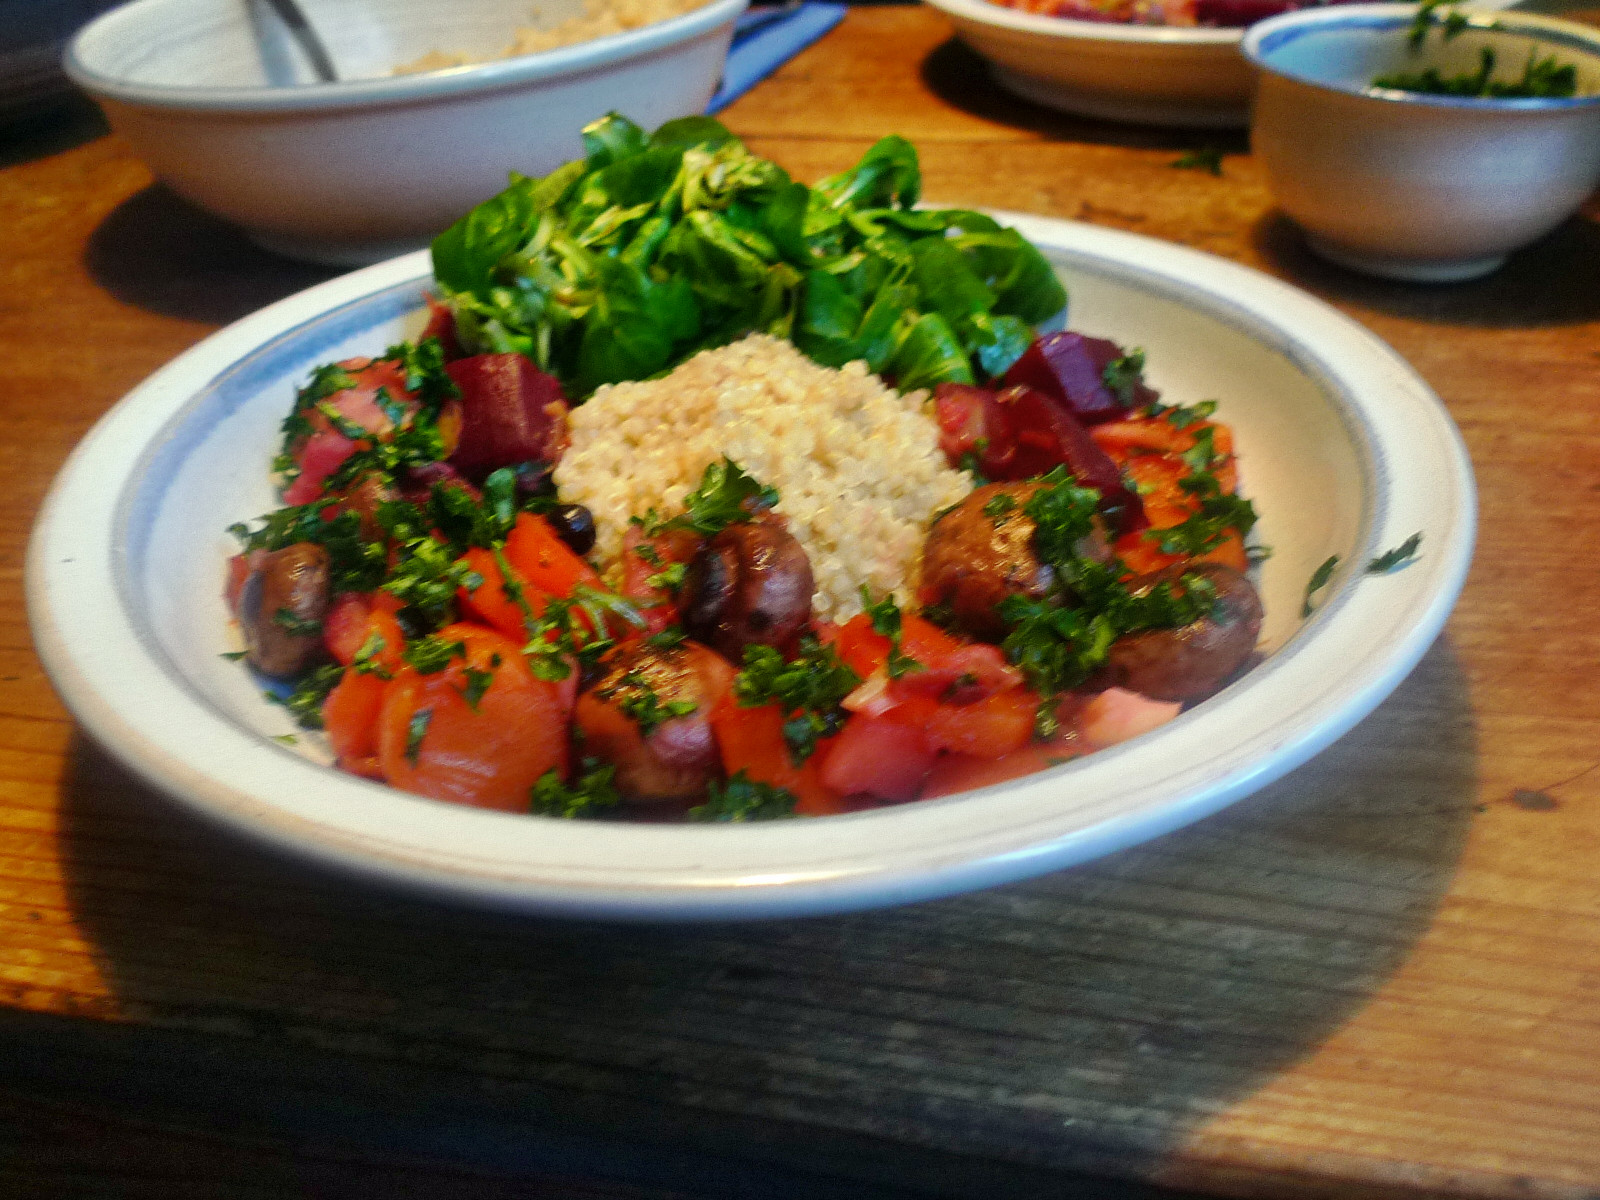 Wurzelgemüse-Quinoa-Feldsalat - 22.11.14   (14)